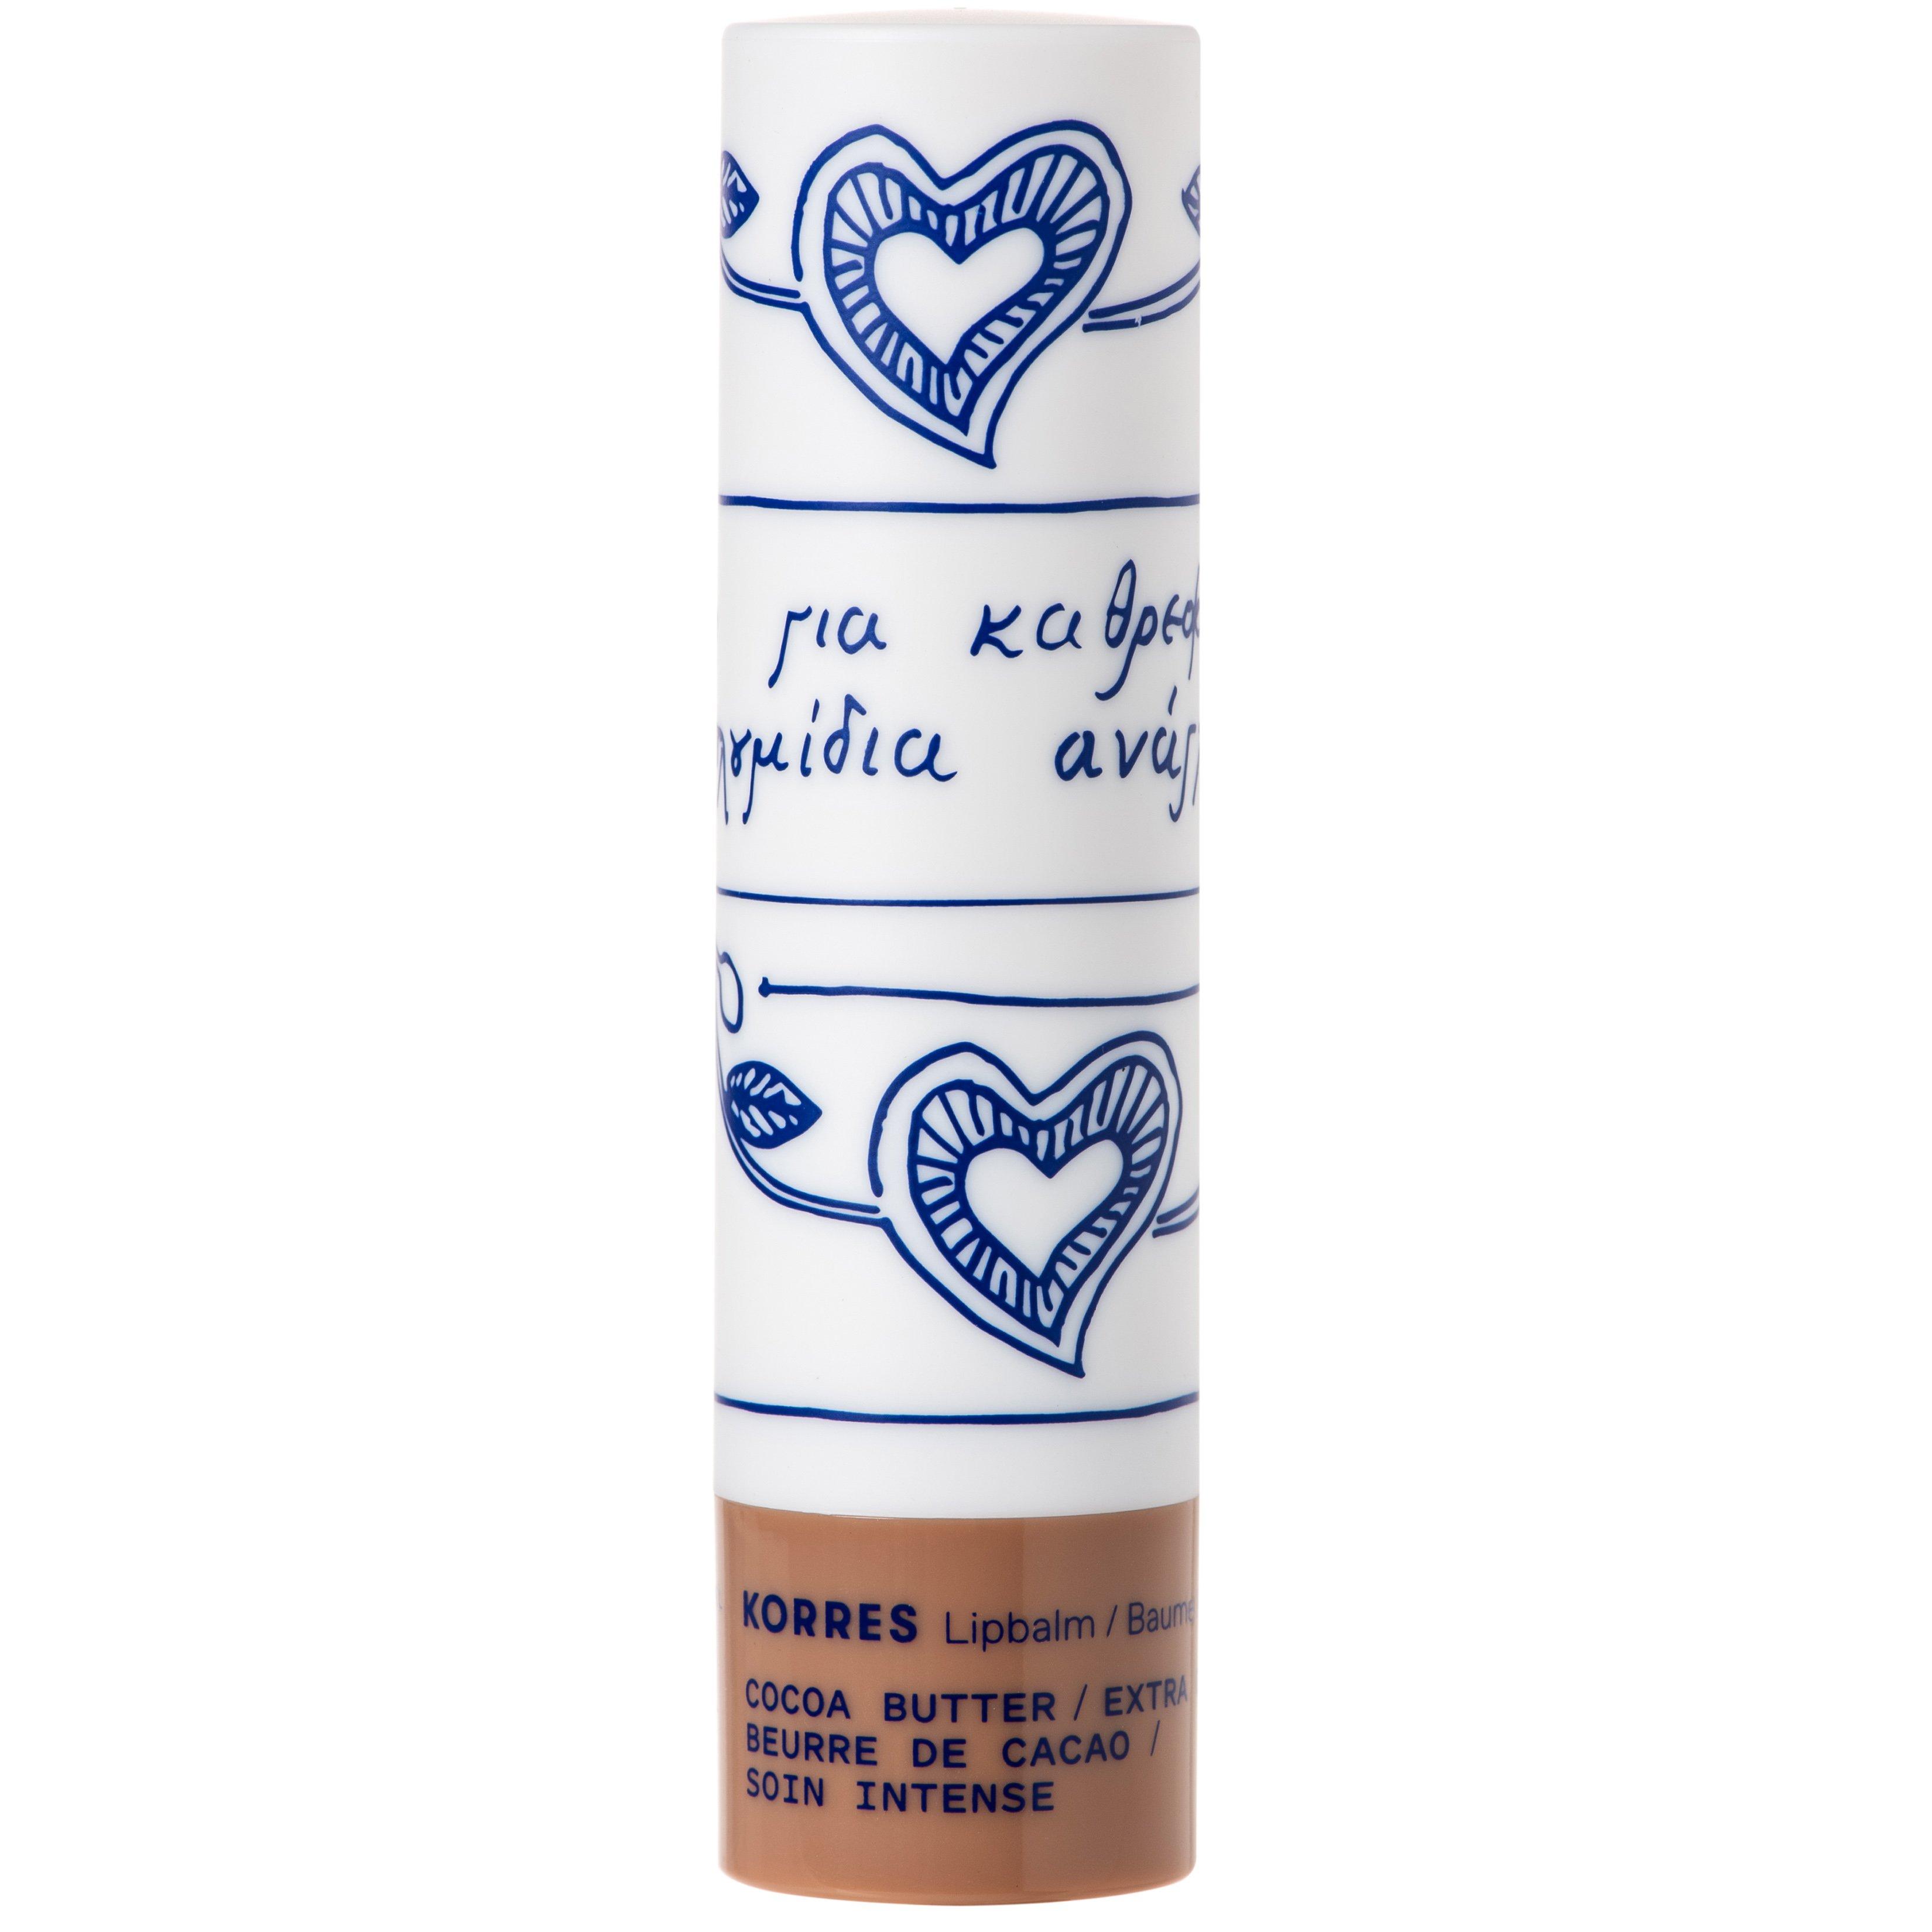 Korres Lip Balm Cocoa Butter Extra Care Εντατική Ενυδατική Φροντίδα για τα Χείλη με Βούτυρο Κακάο για Άμεση Θρέψη 4.5g